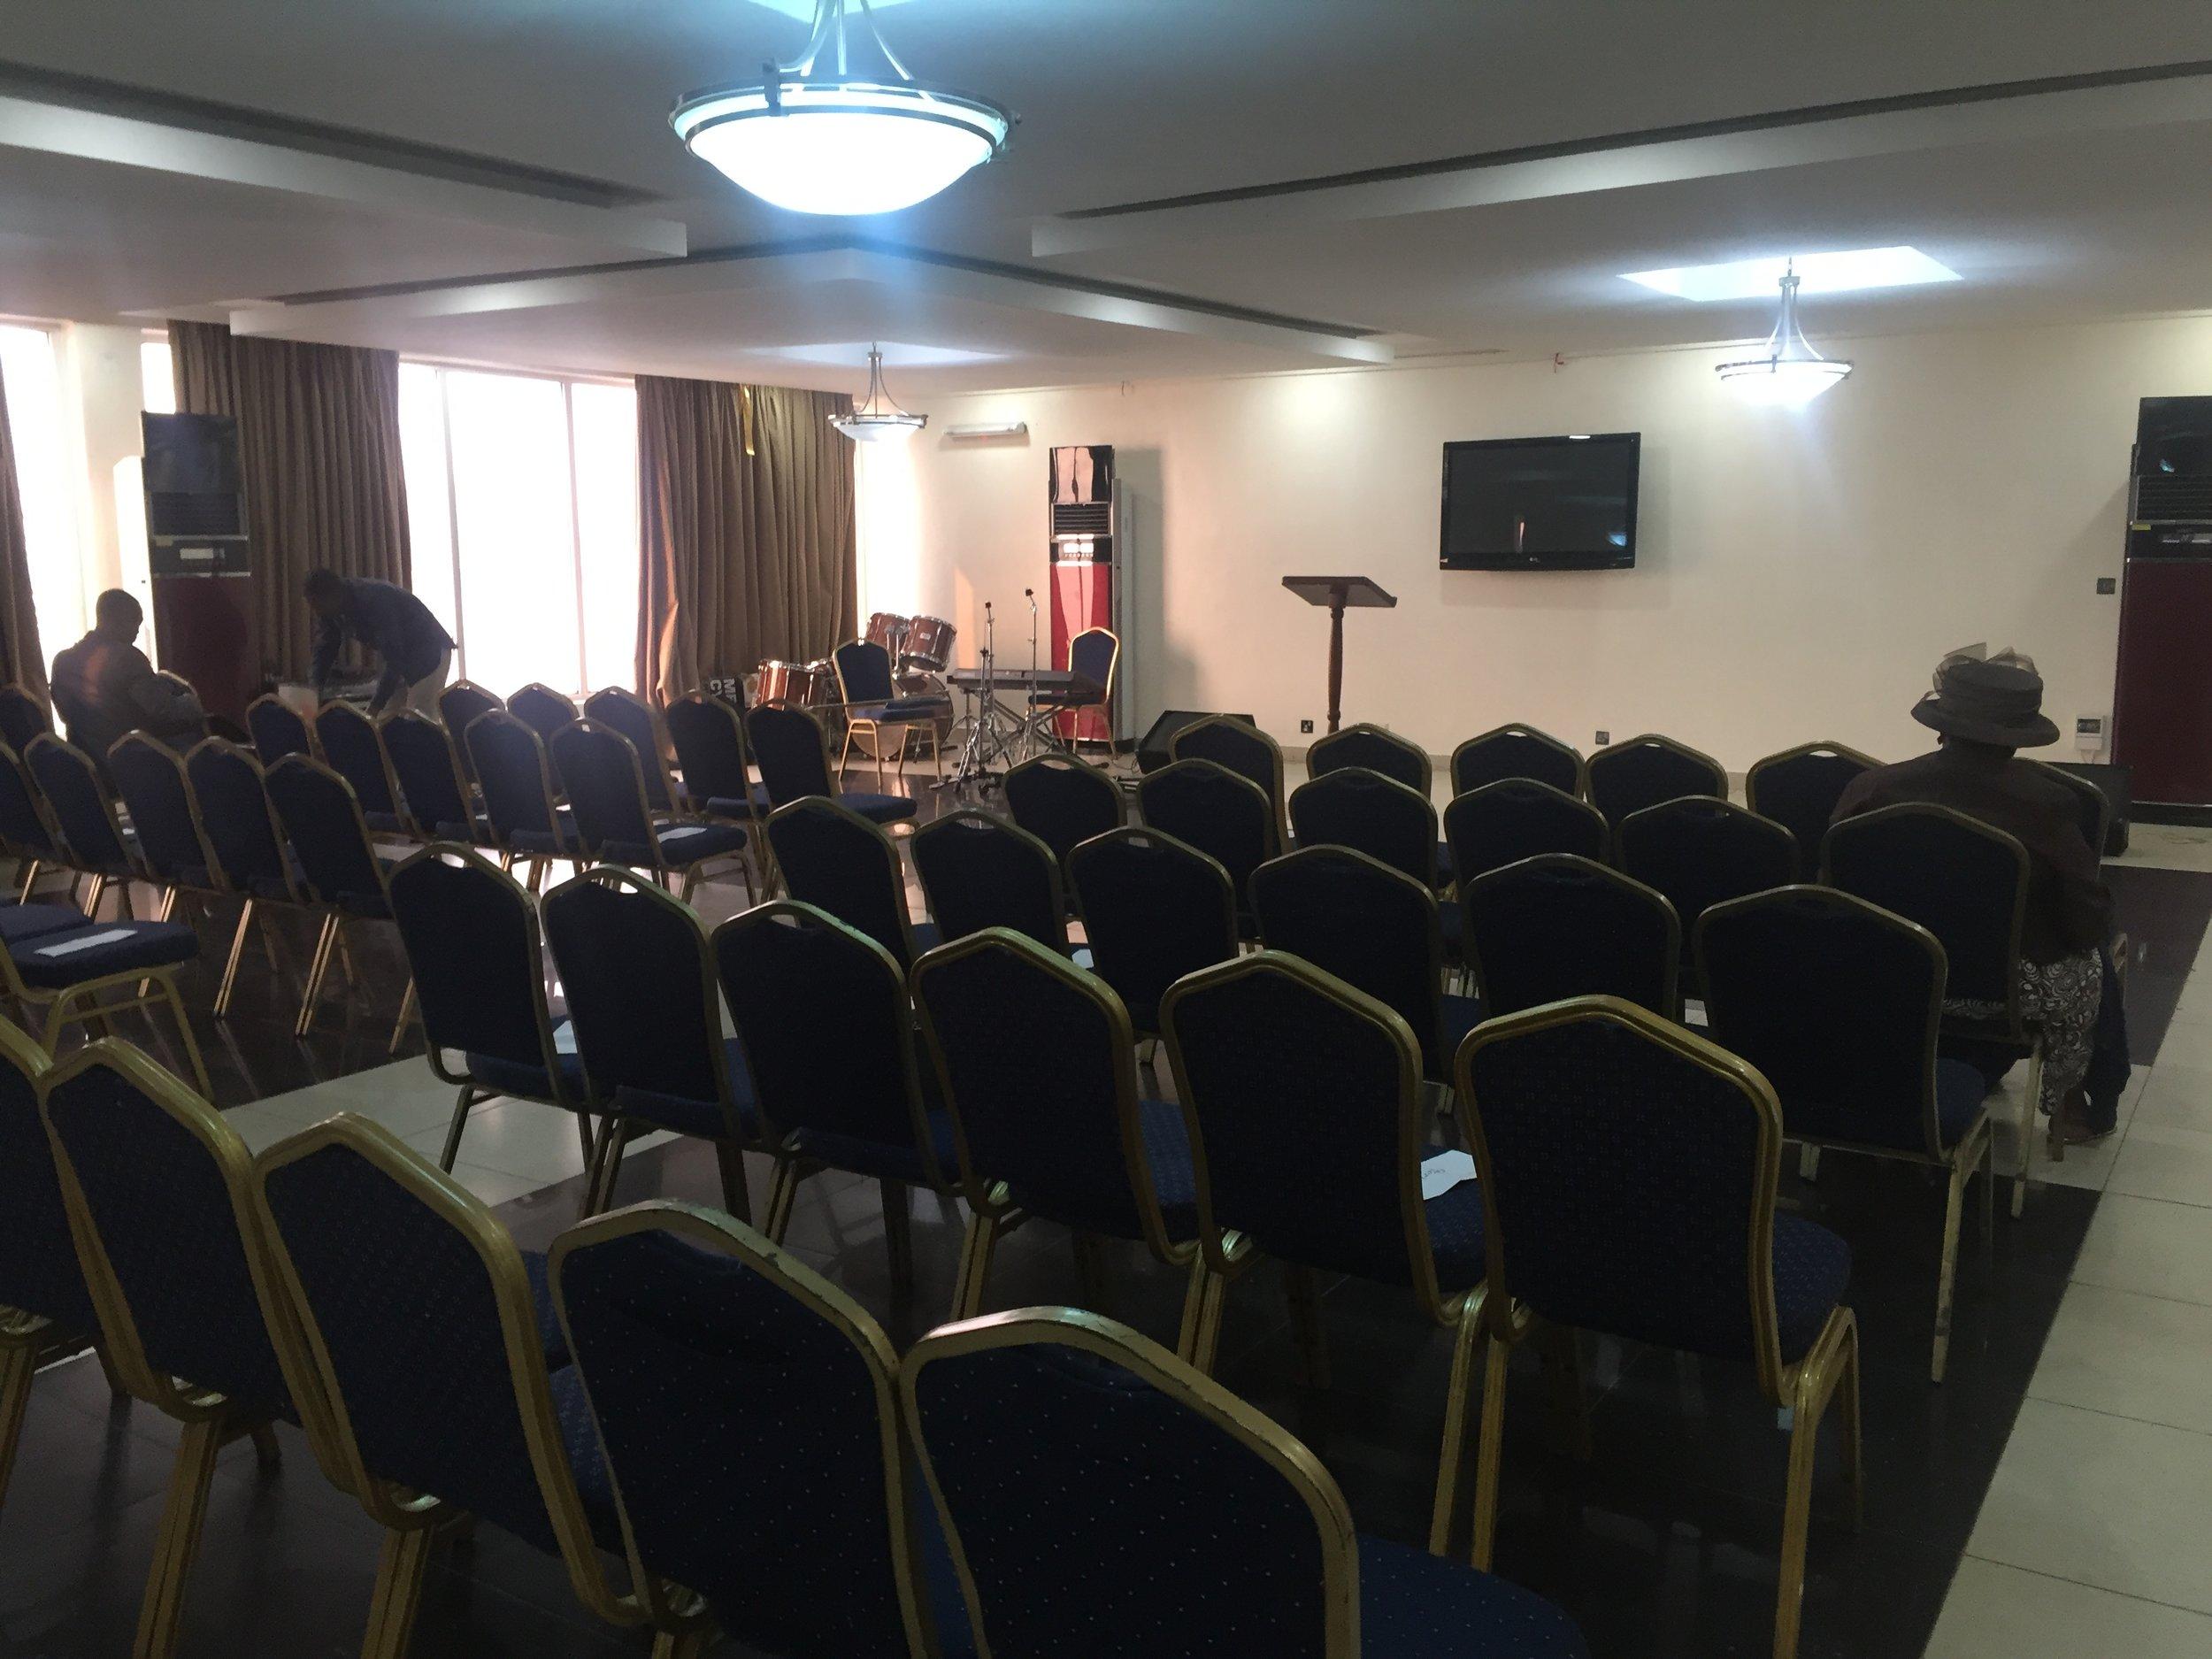 Westwood hotel Ikoyi | The Ajala Bug